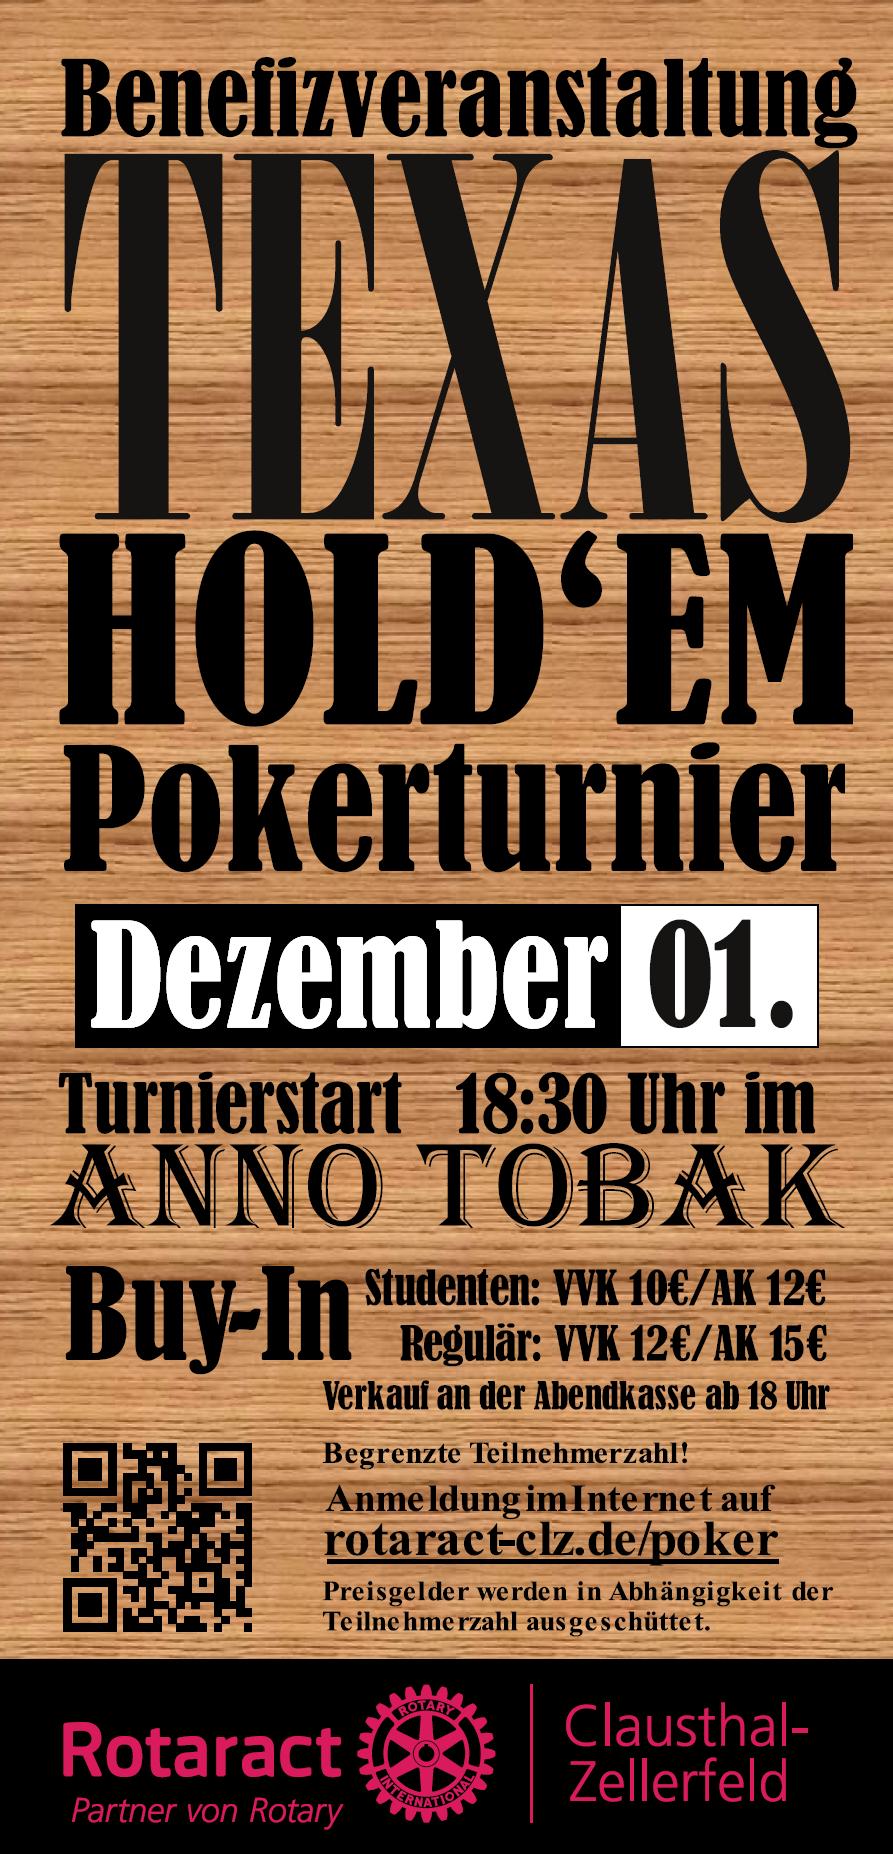 rotaract-clz.de/poker